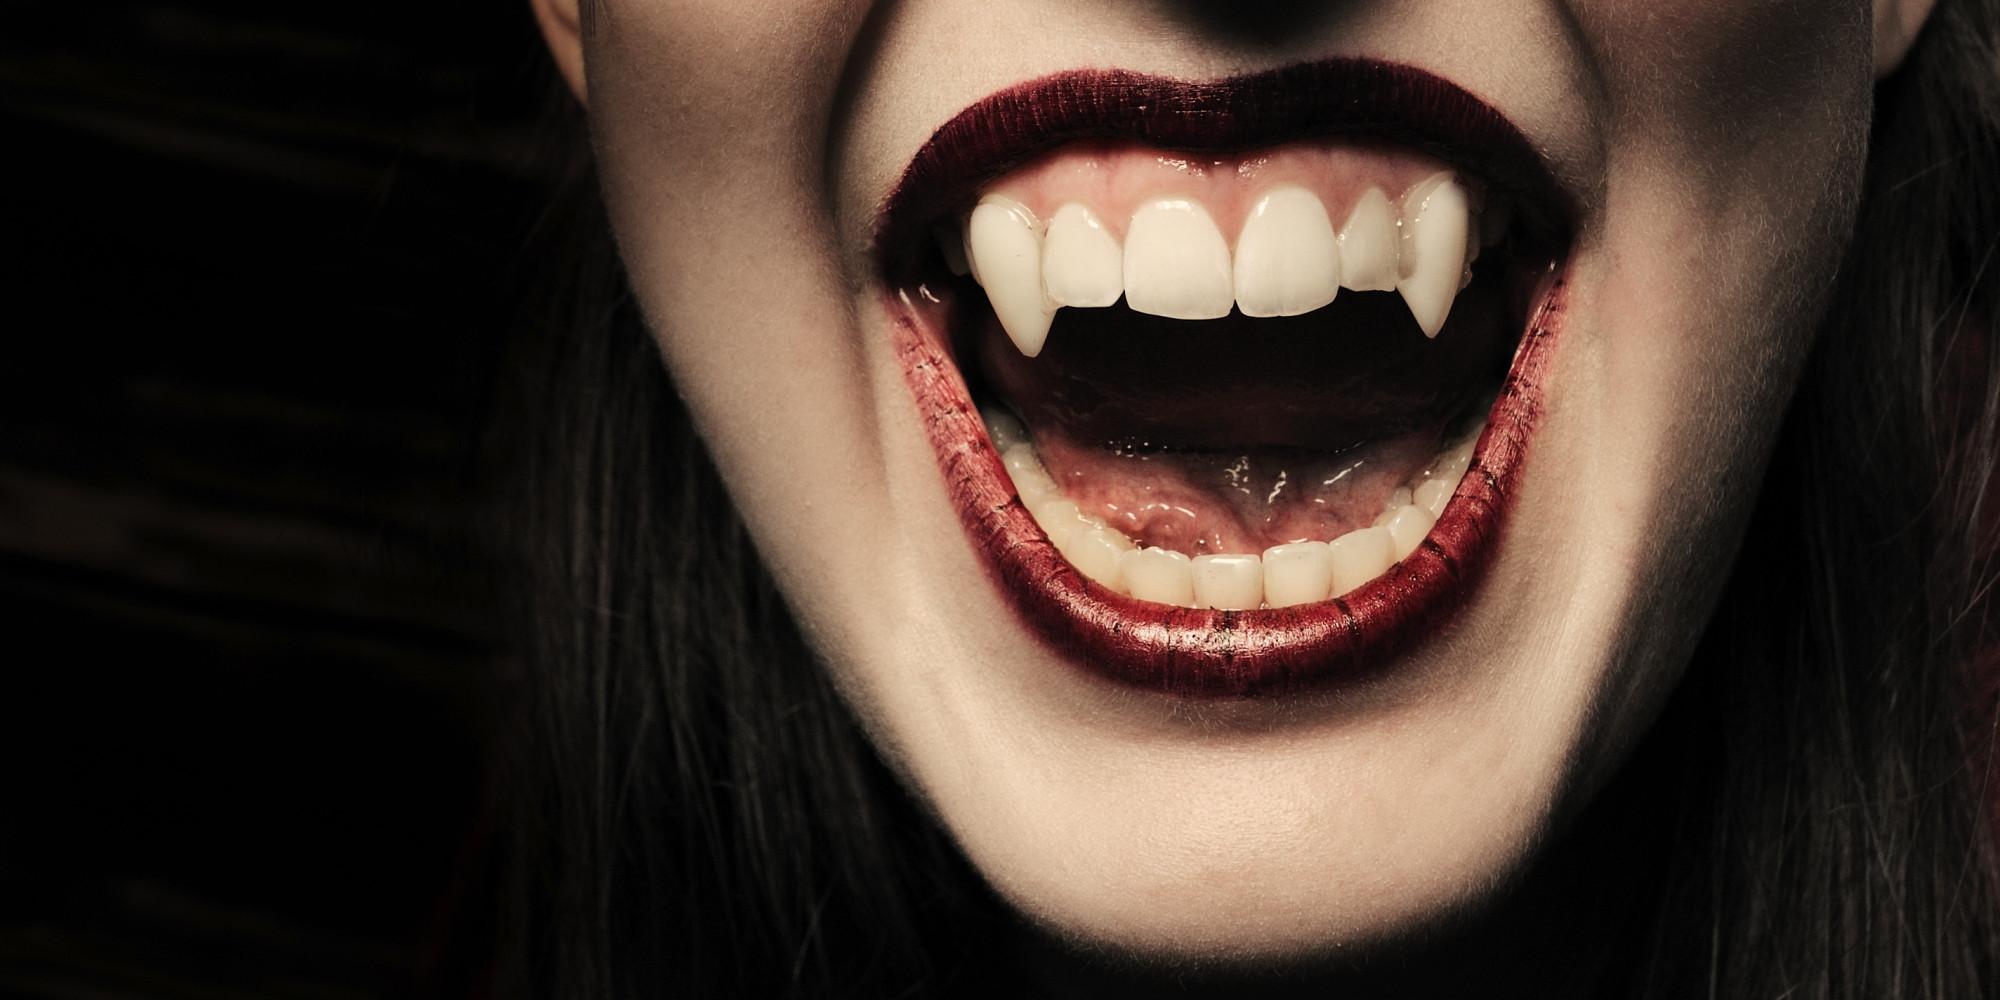 Vampiri: Anatomia e Fisiologia